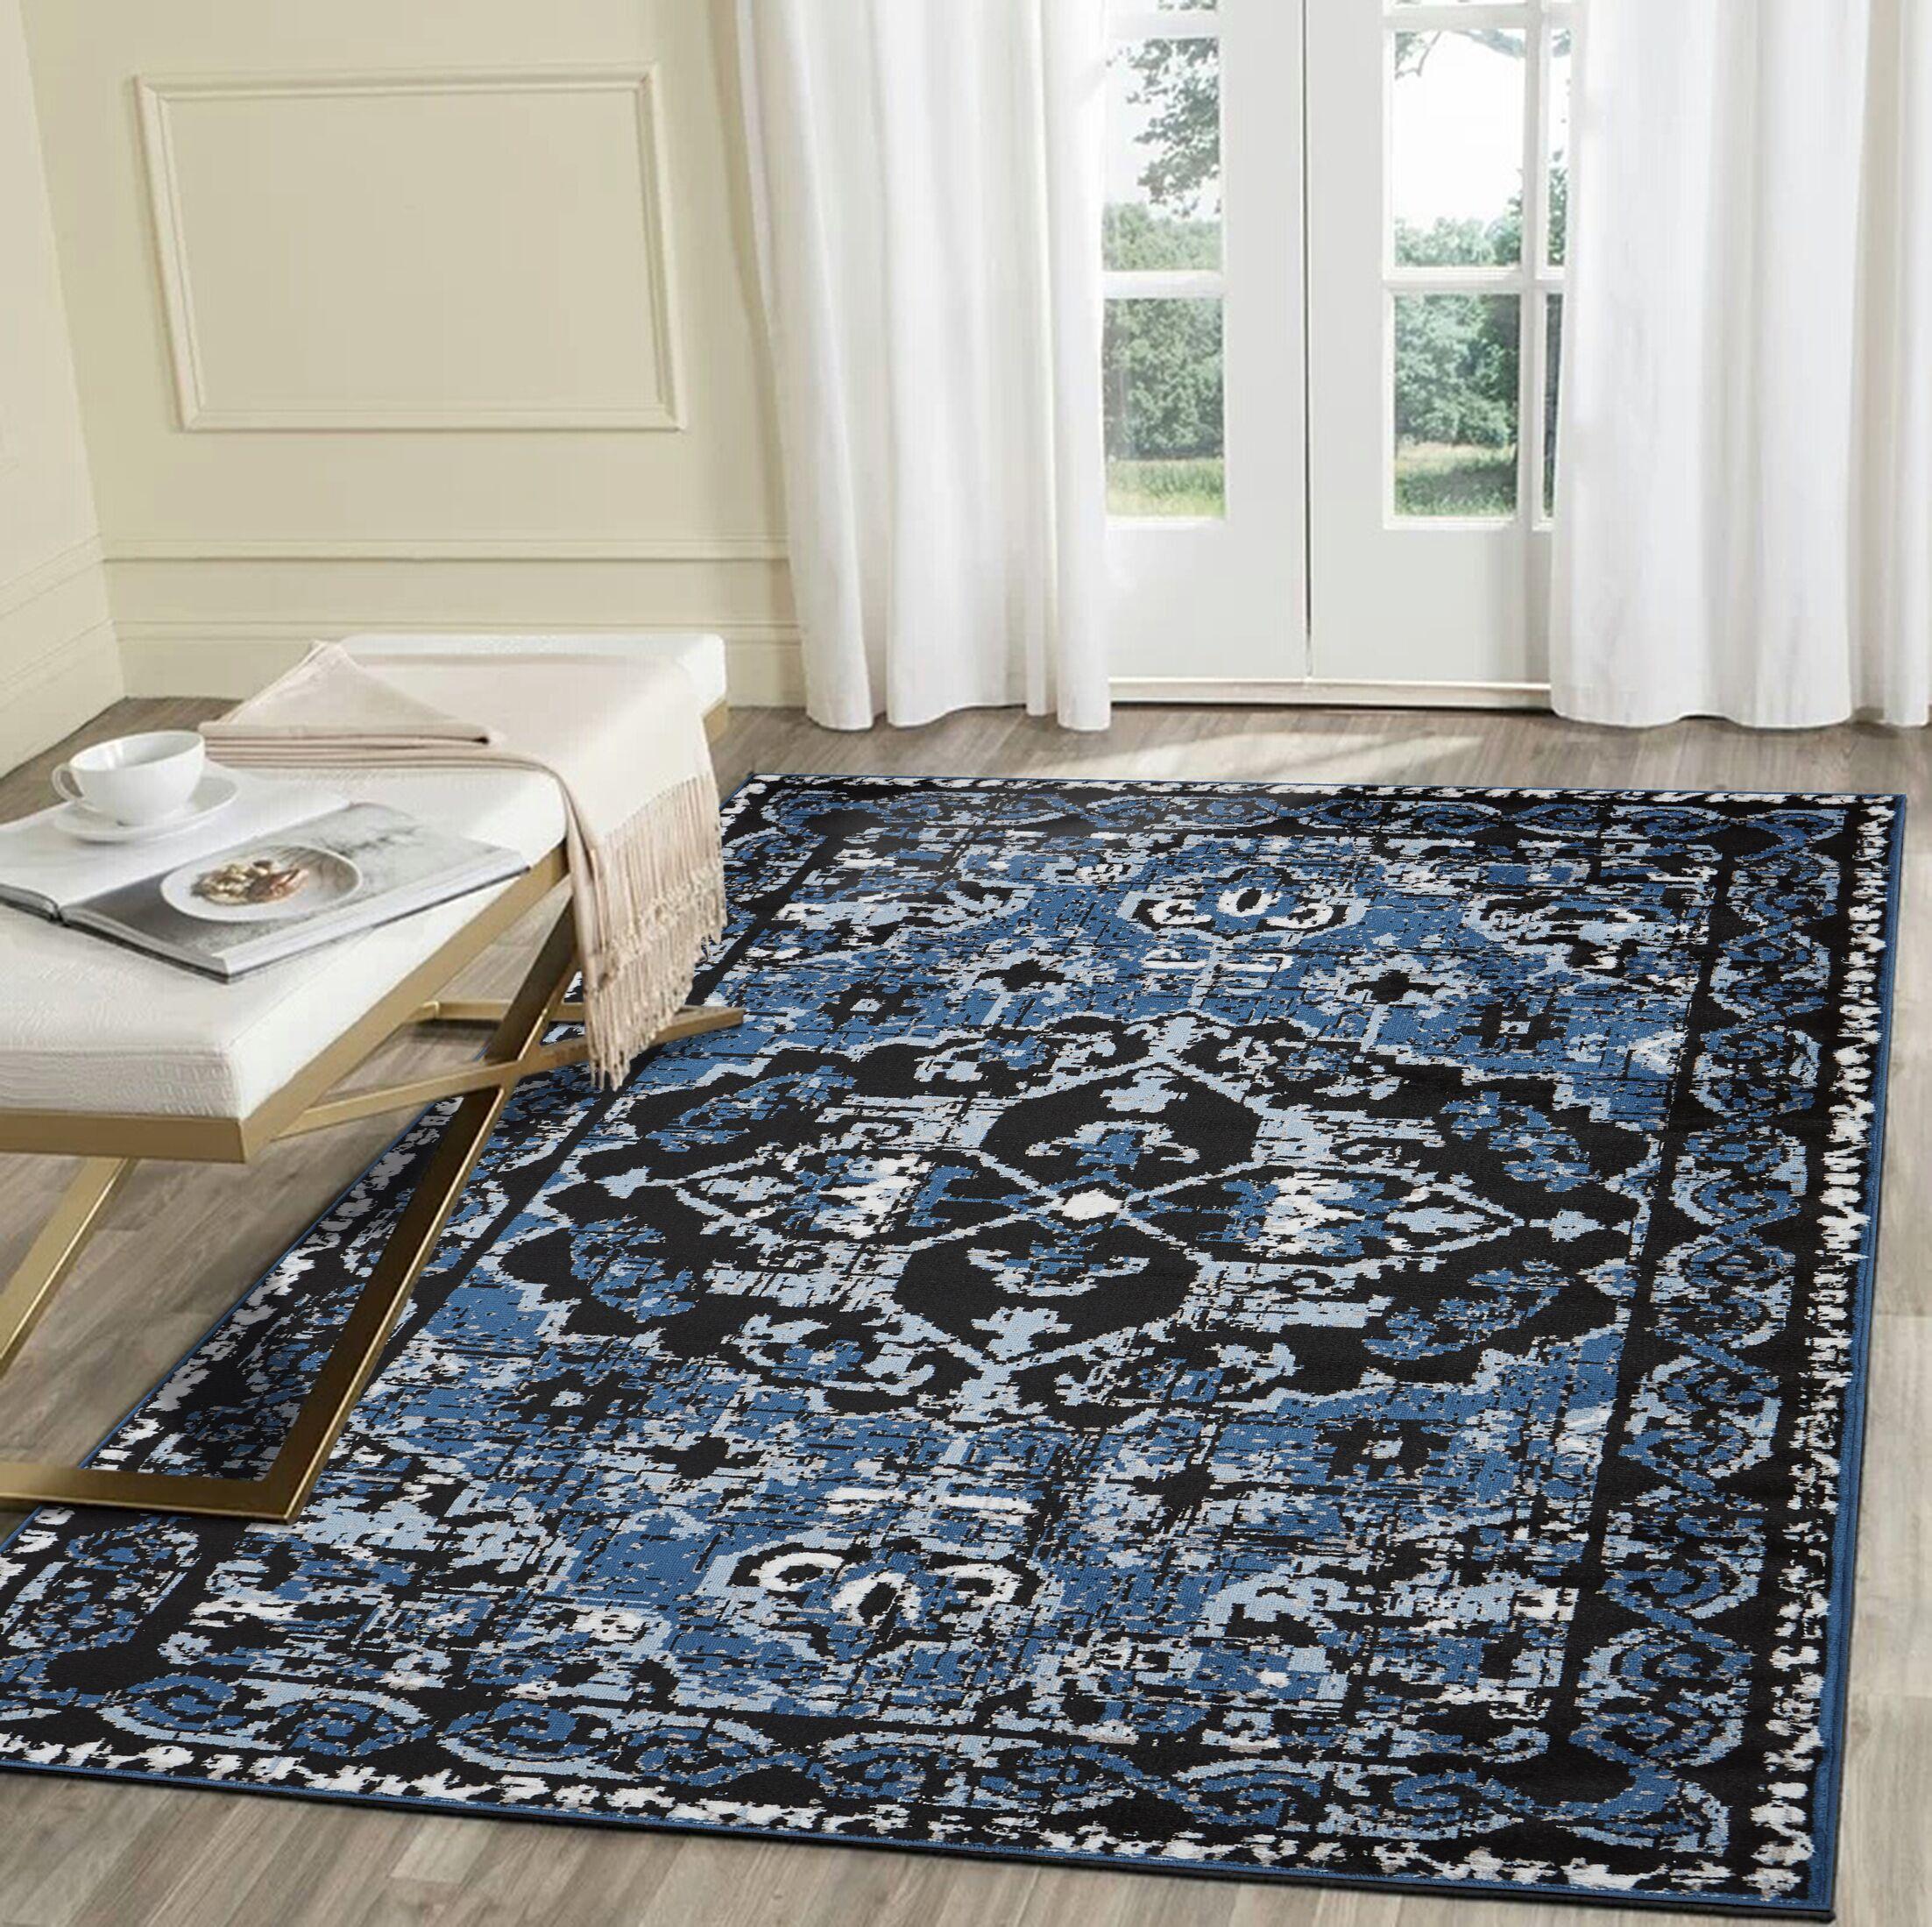 Apsel Black/Spa Blue Area Rug Rug Size: Rectangle 7'9